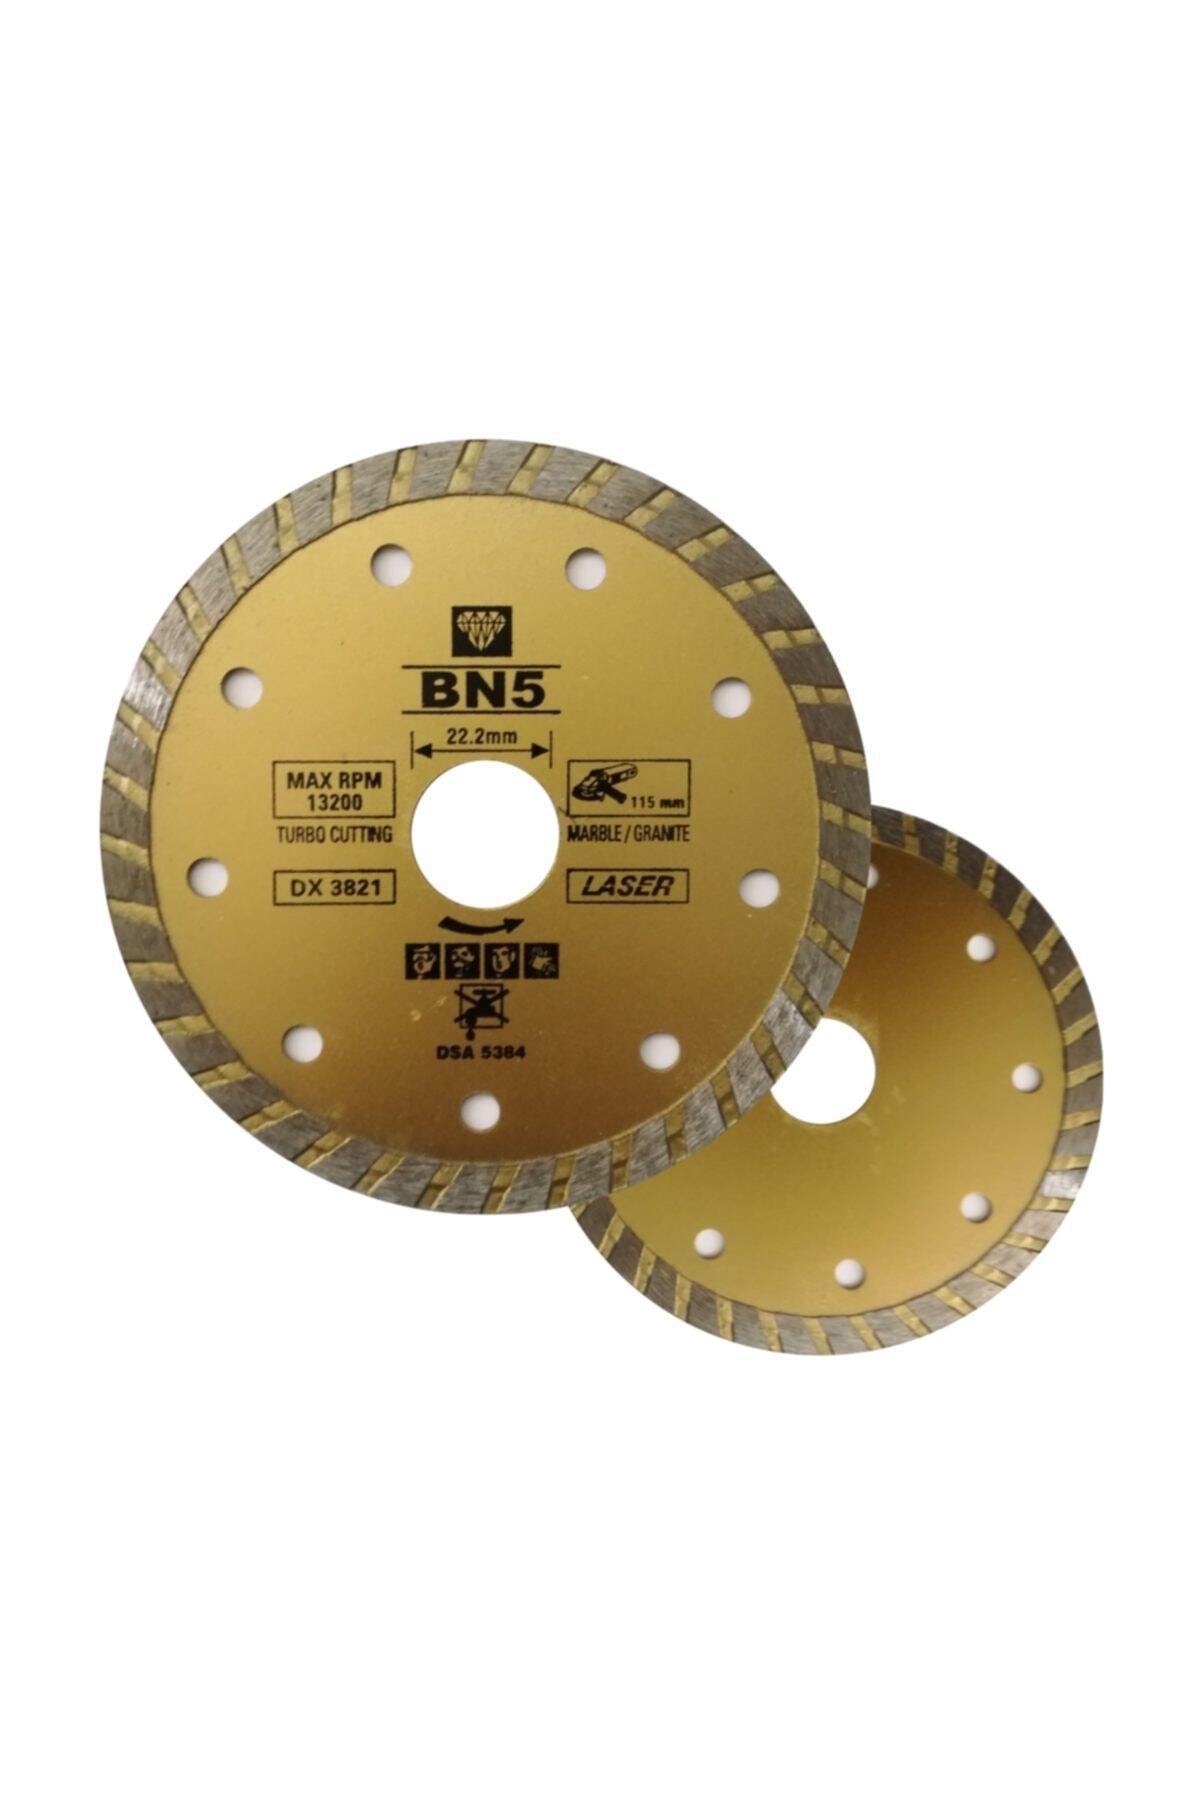 BN5 Ahşap Kesici Mermer Fayans Kesme 115 Mm Disk Seti Spiral Taşlama Kesici Diskleri 2